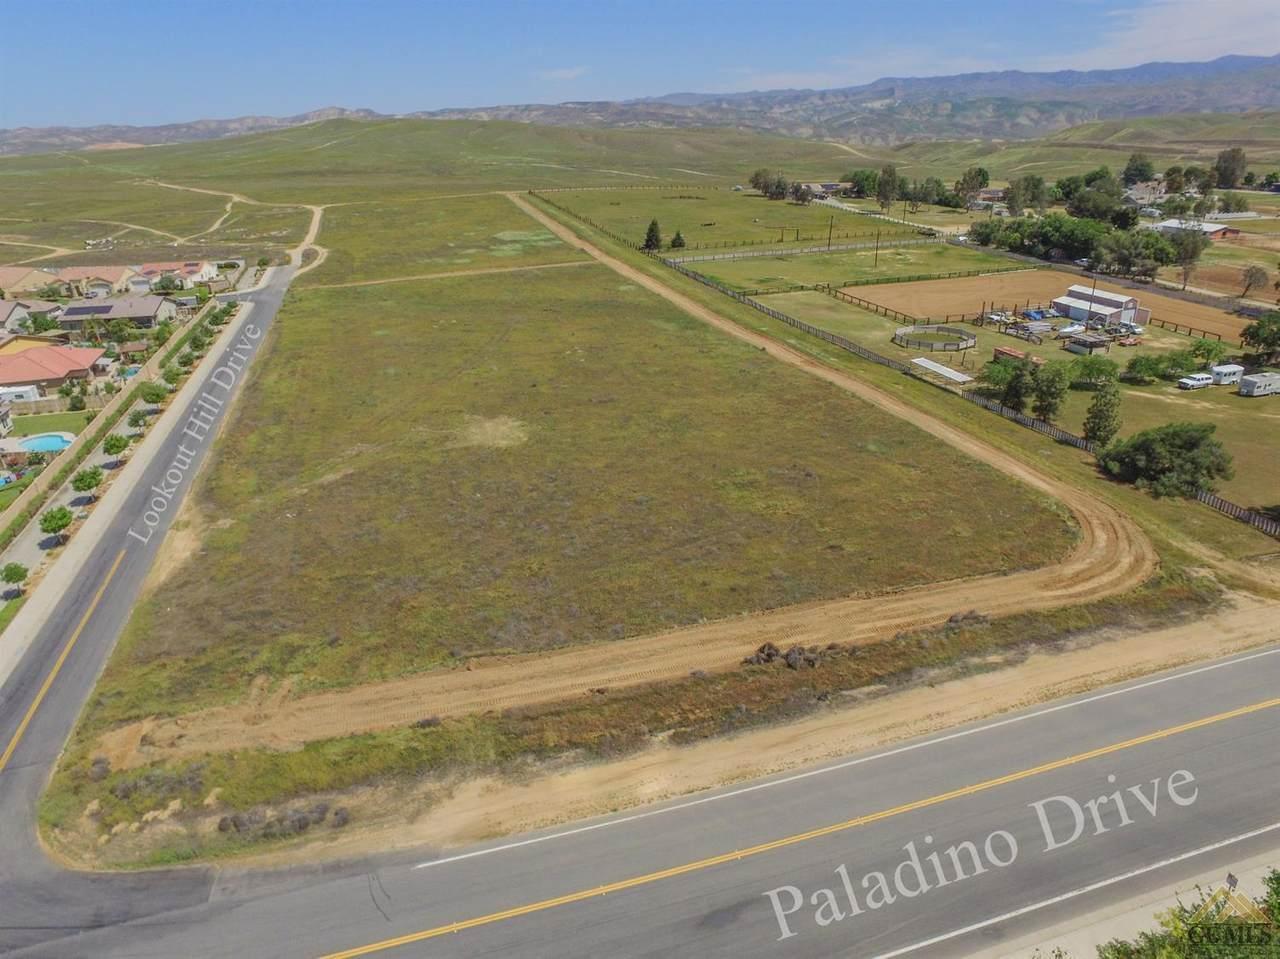 0 Paladino Drive - Photo 1